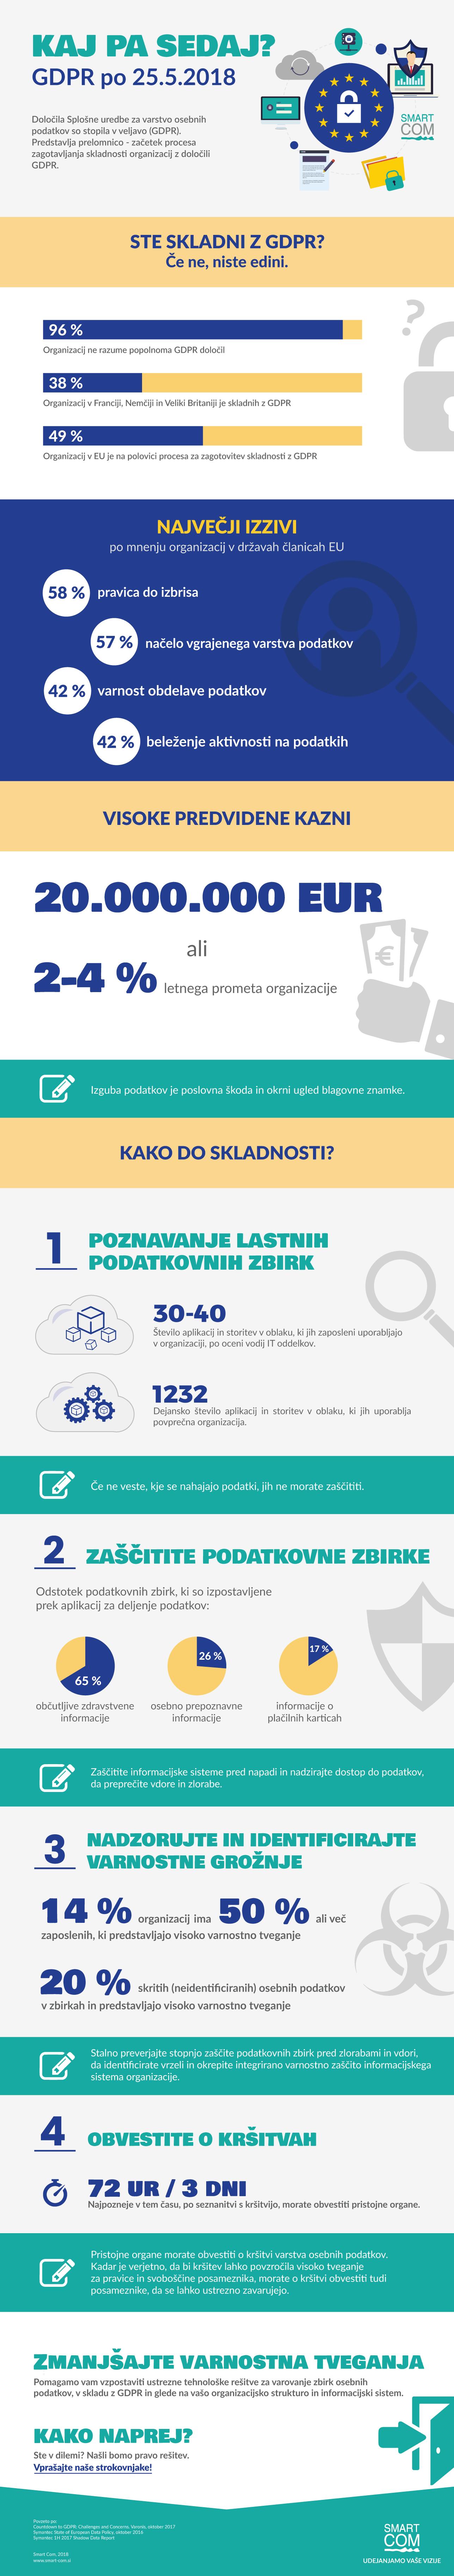 infografika-GDPR_web